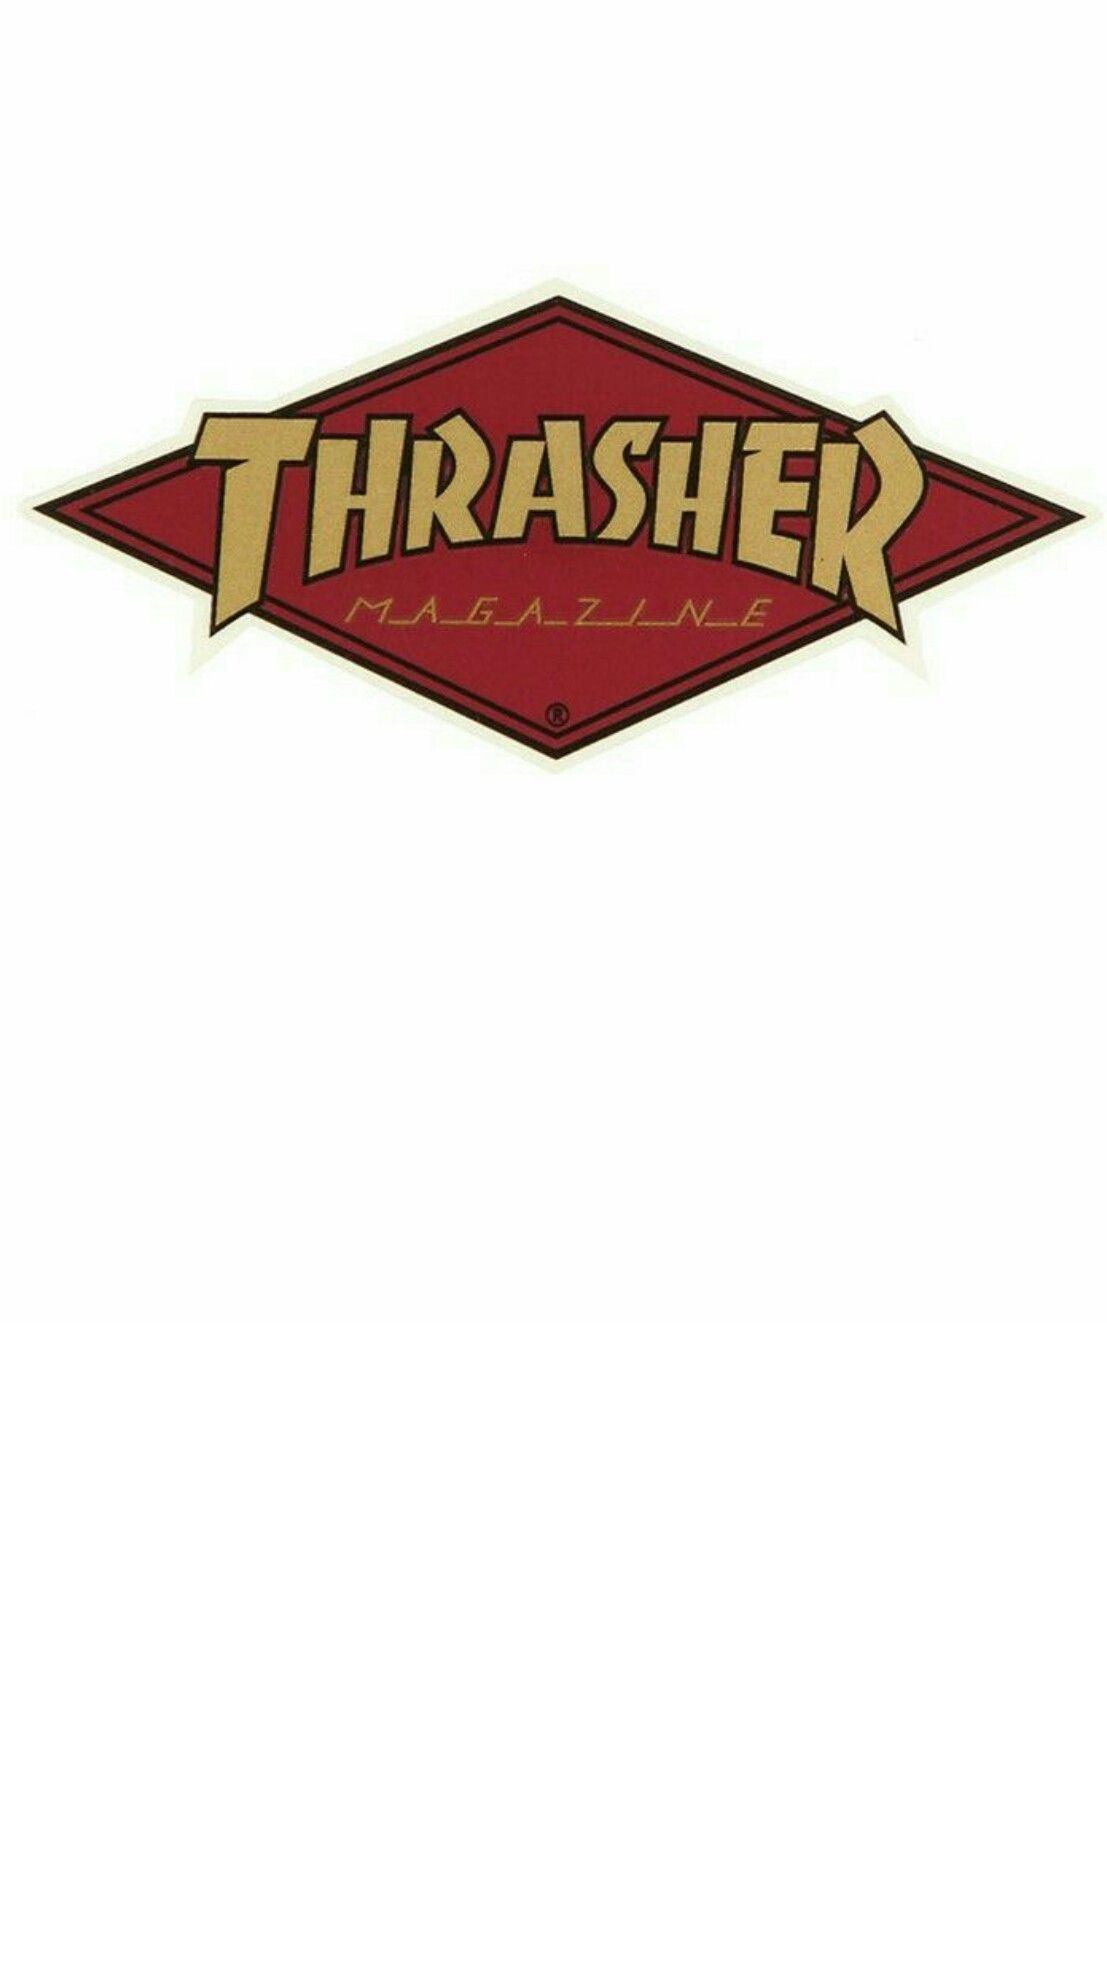 1107x1965 Thrasher Skate Usa Black Wallpaper Android Iphone